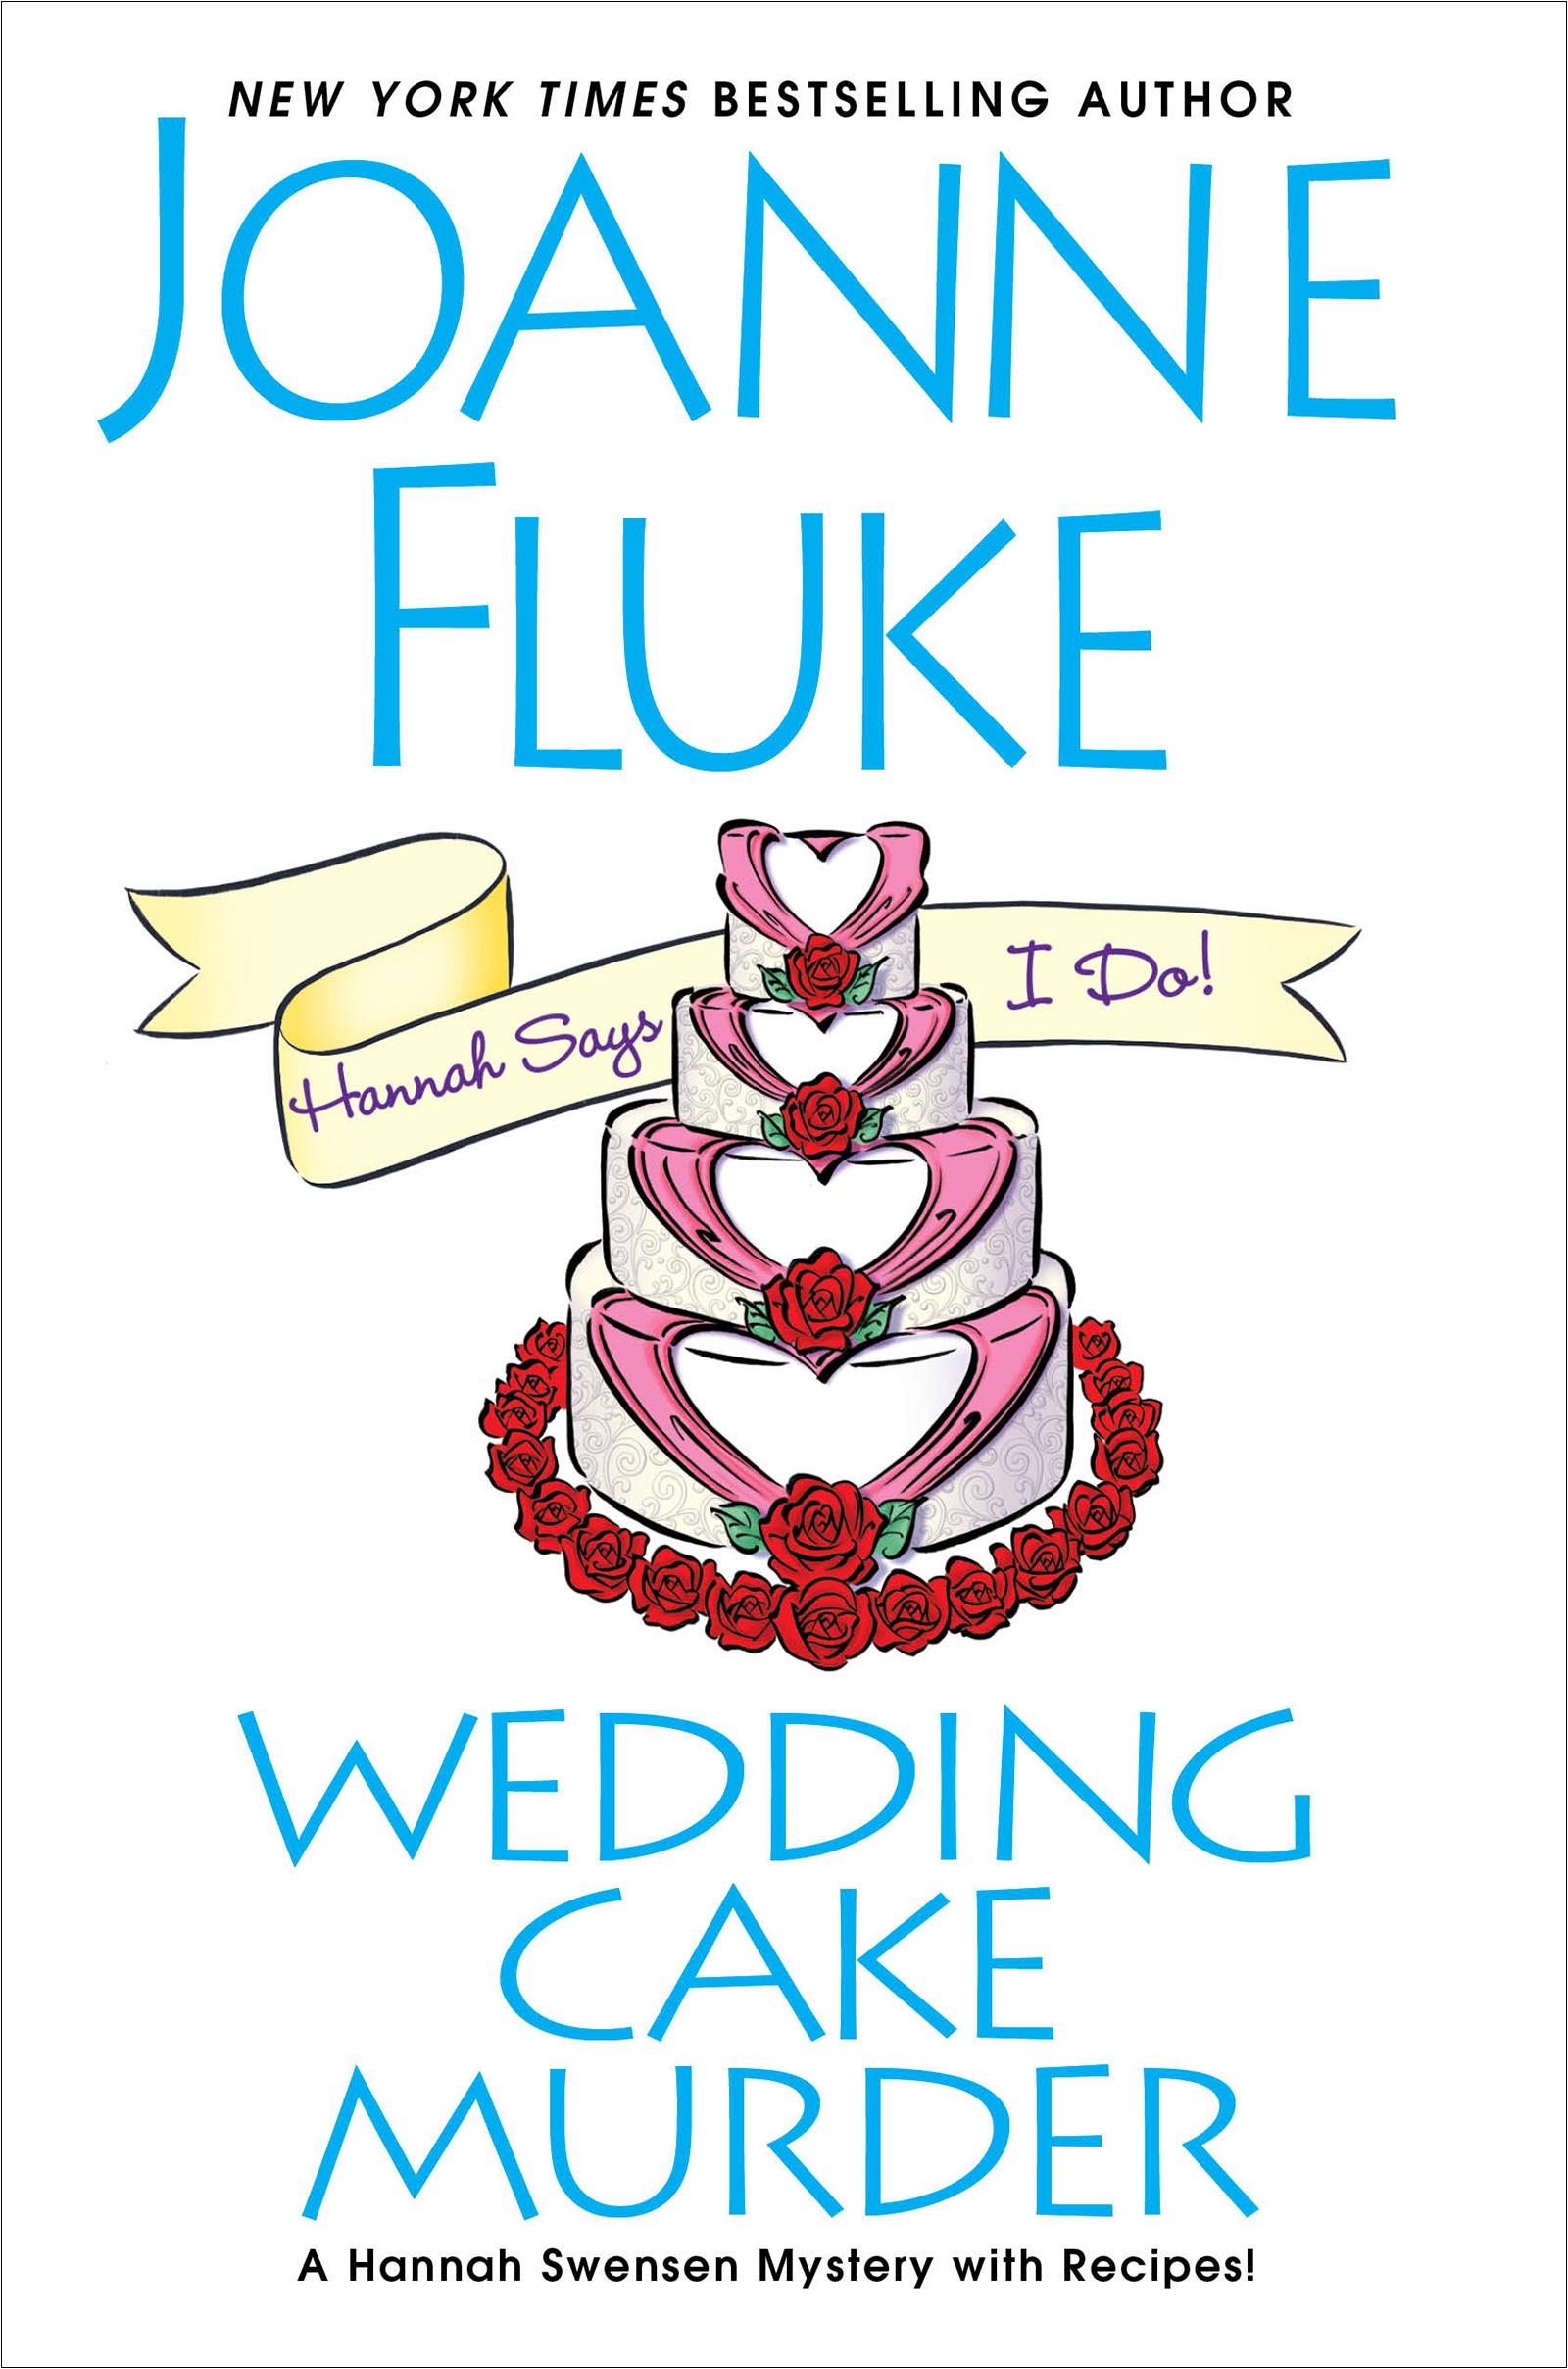 Wedding cake murder cover image